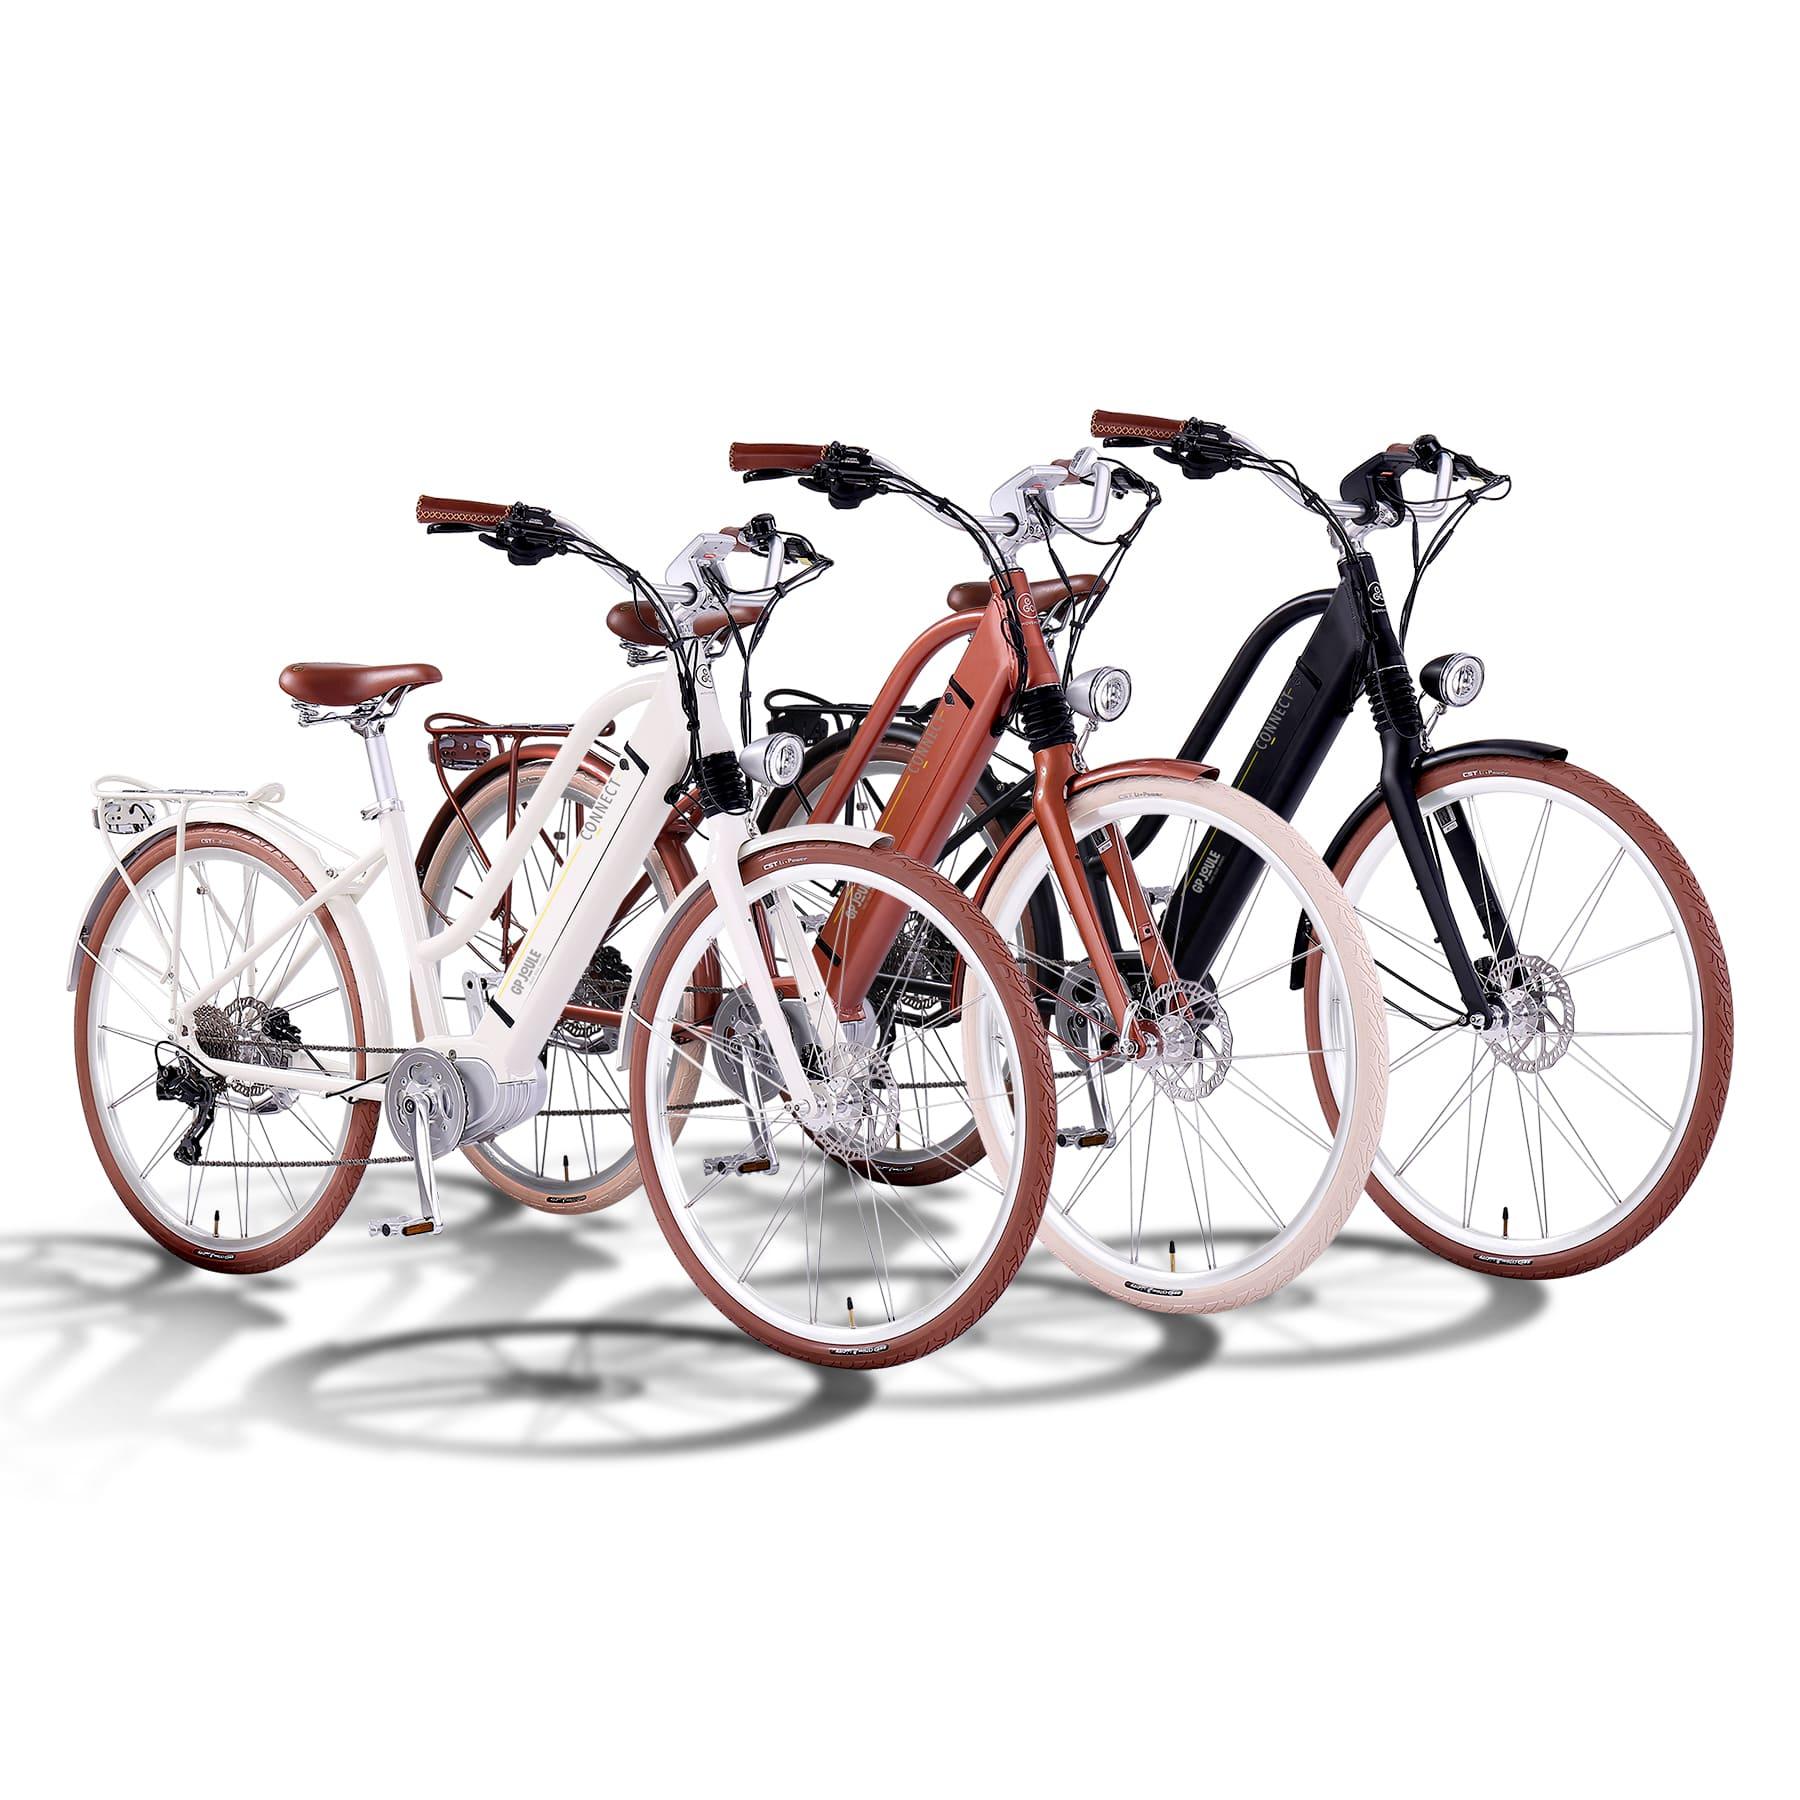 E-Bike EGO Movement Classic Woman 25 alle Farben Vorderansicht